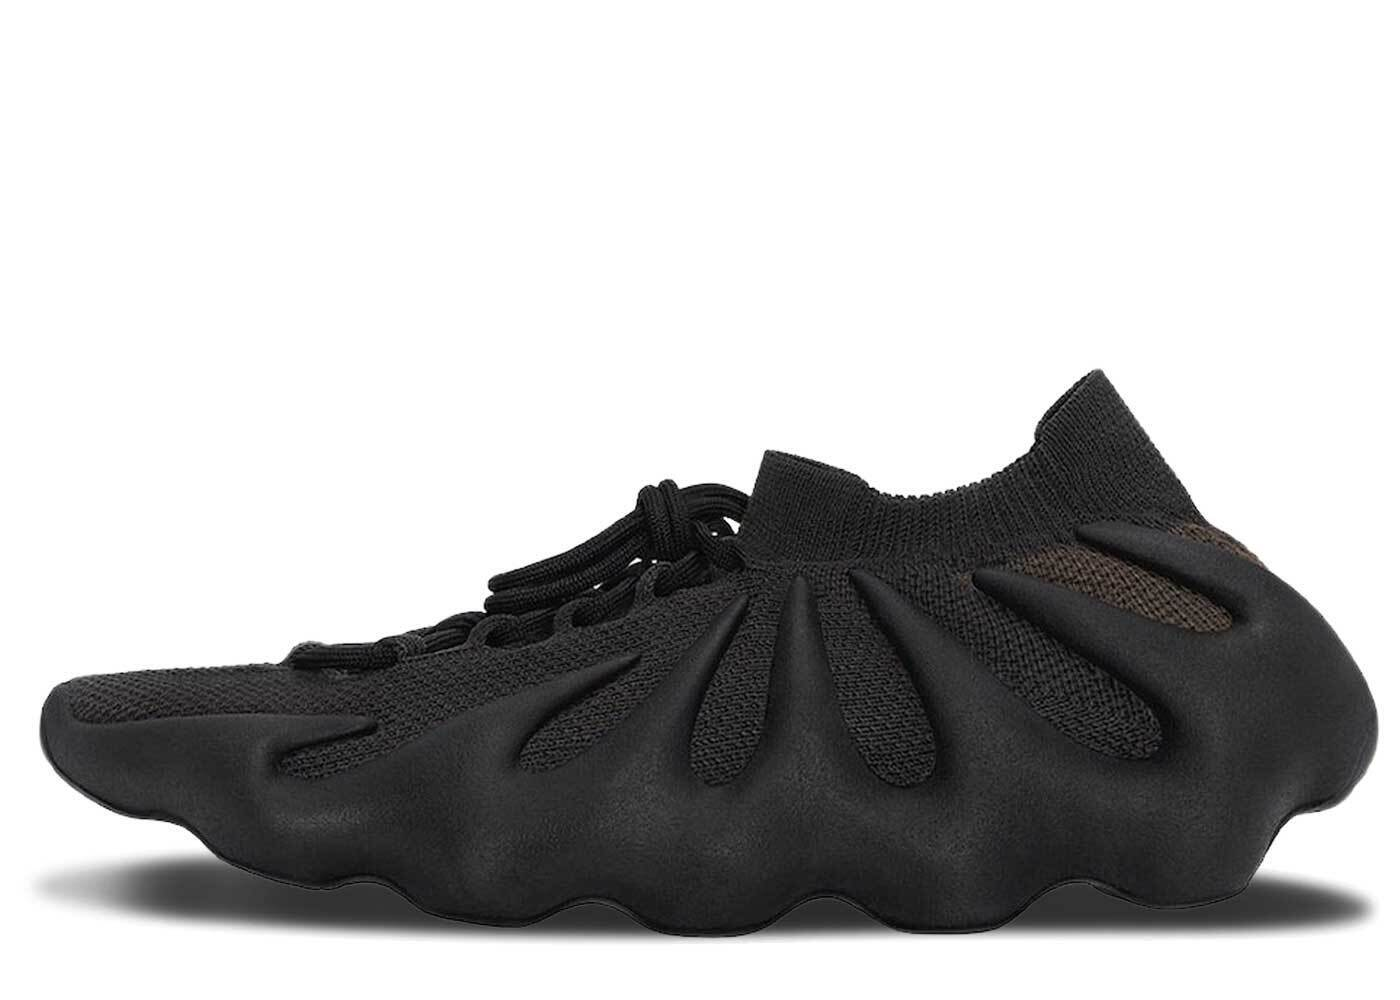 adidas Yeezy 450 Dark Slateの写真